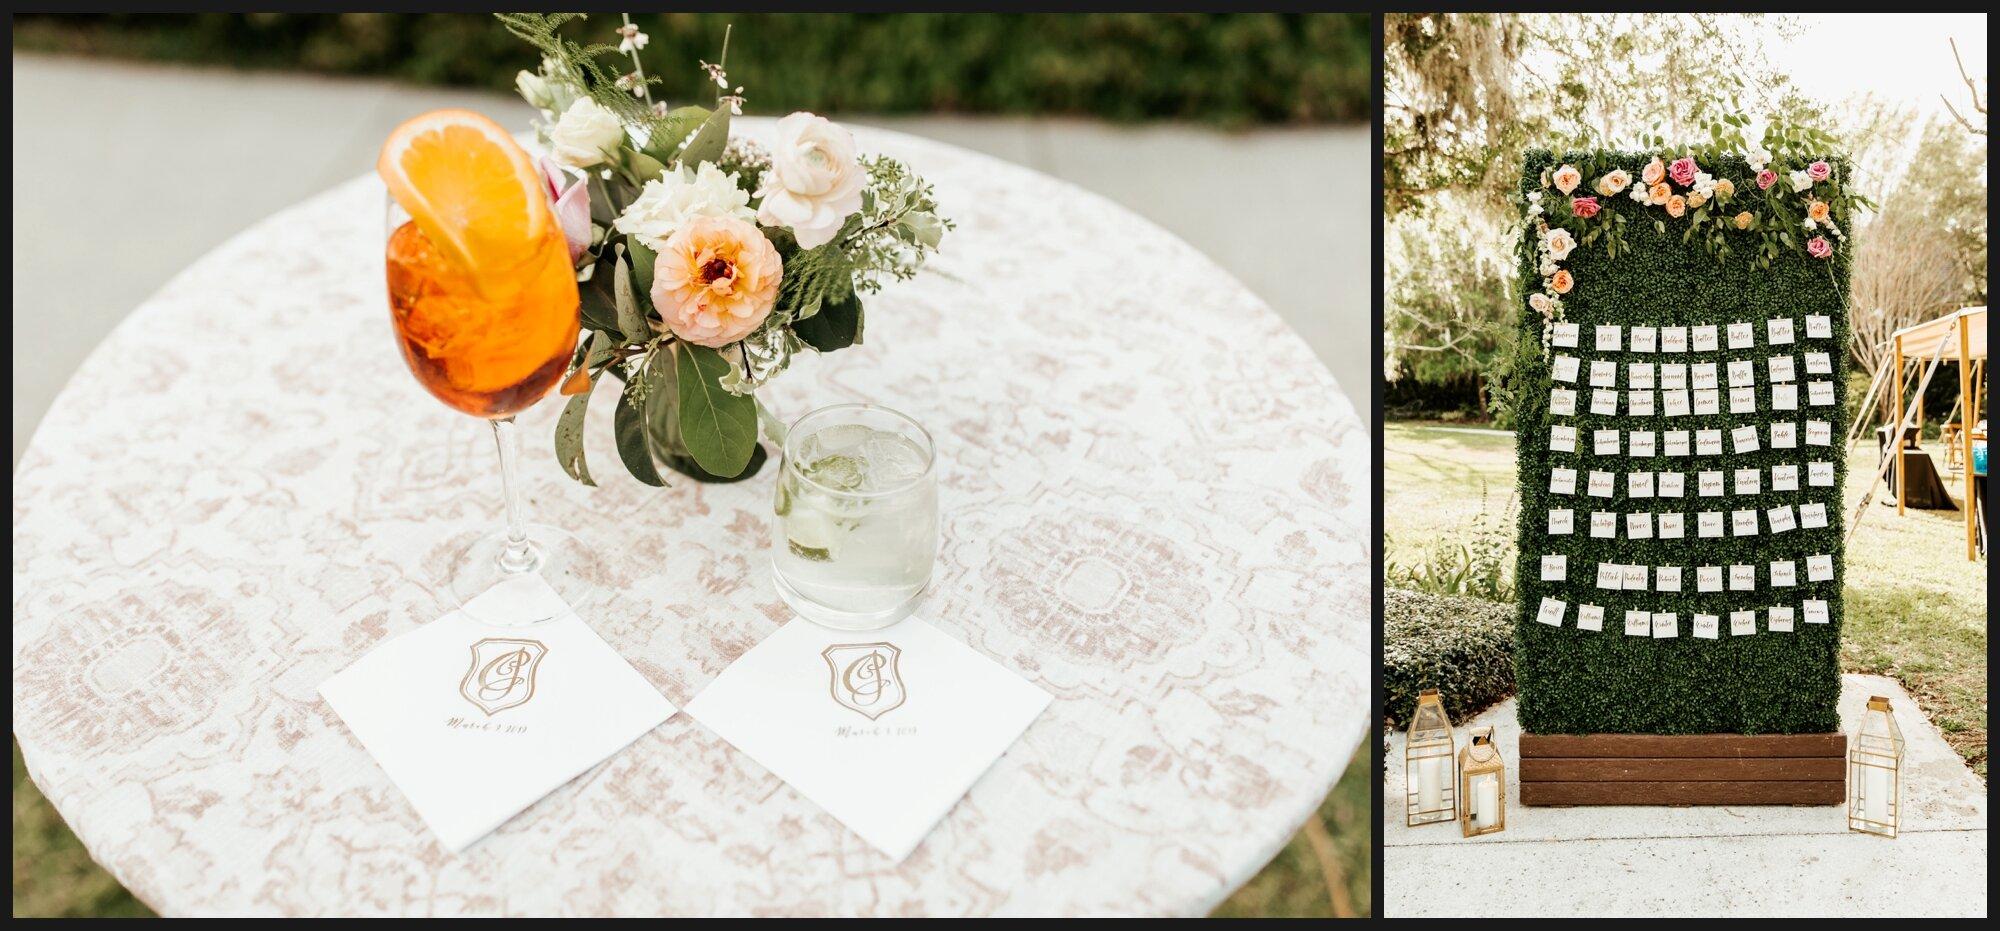 Orlando-Wedding-Photographer-destination-wedding-photographer-florida-wedding-photographer-hawaii-wedding-photographer_0713.jpg